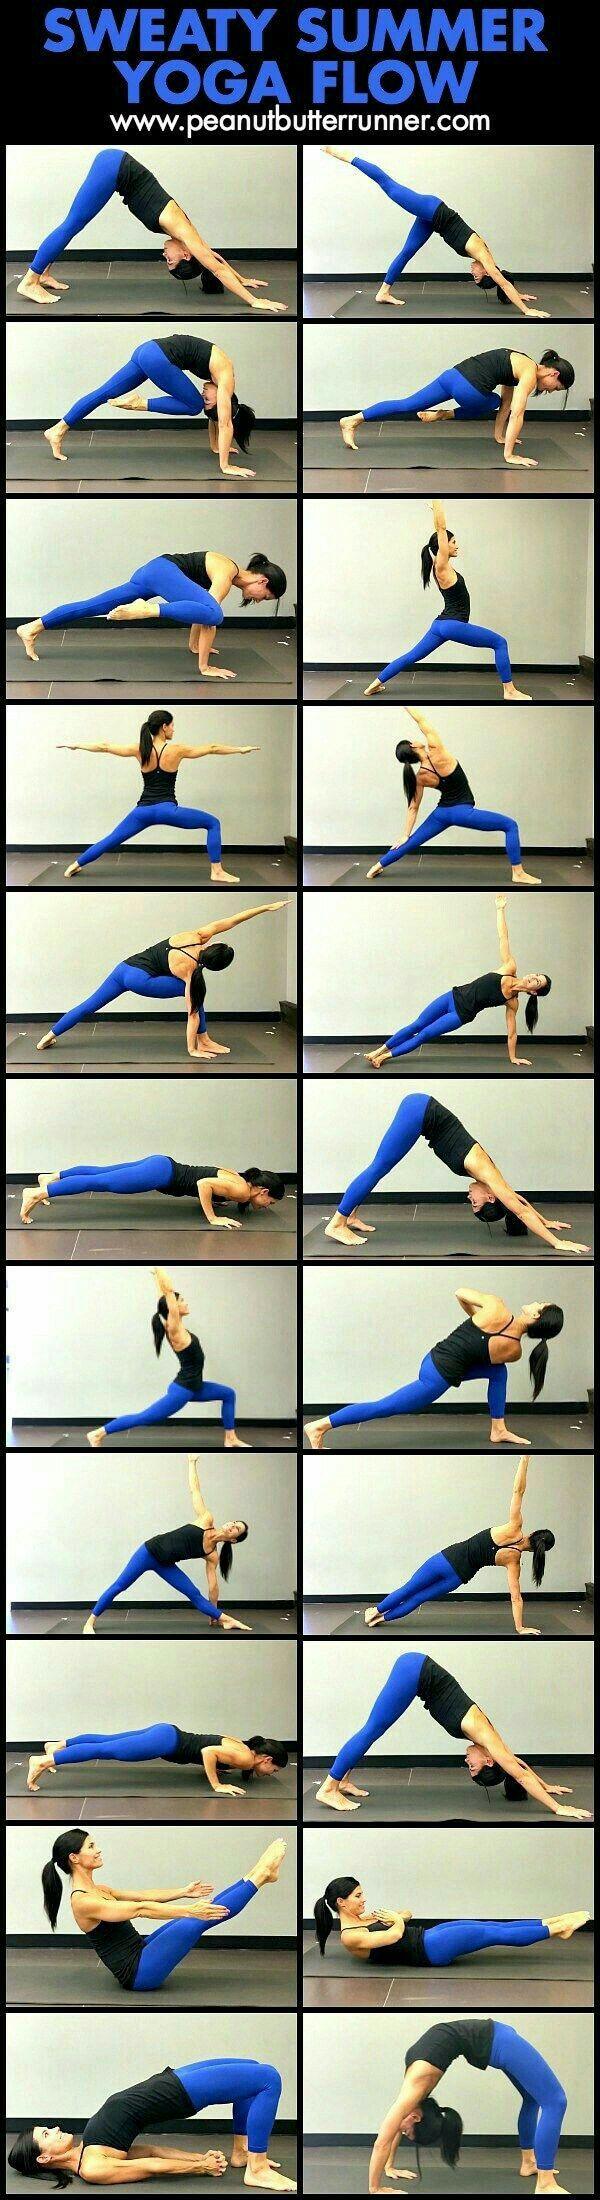 Sweaty summer yoga flow